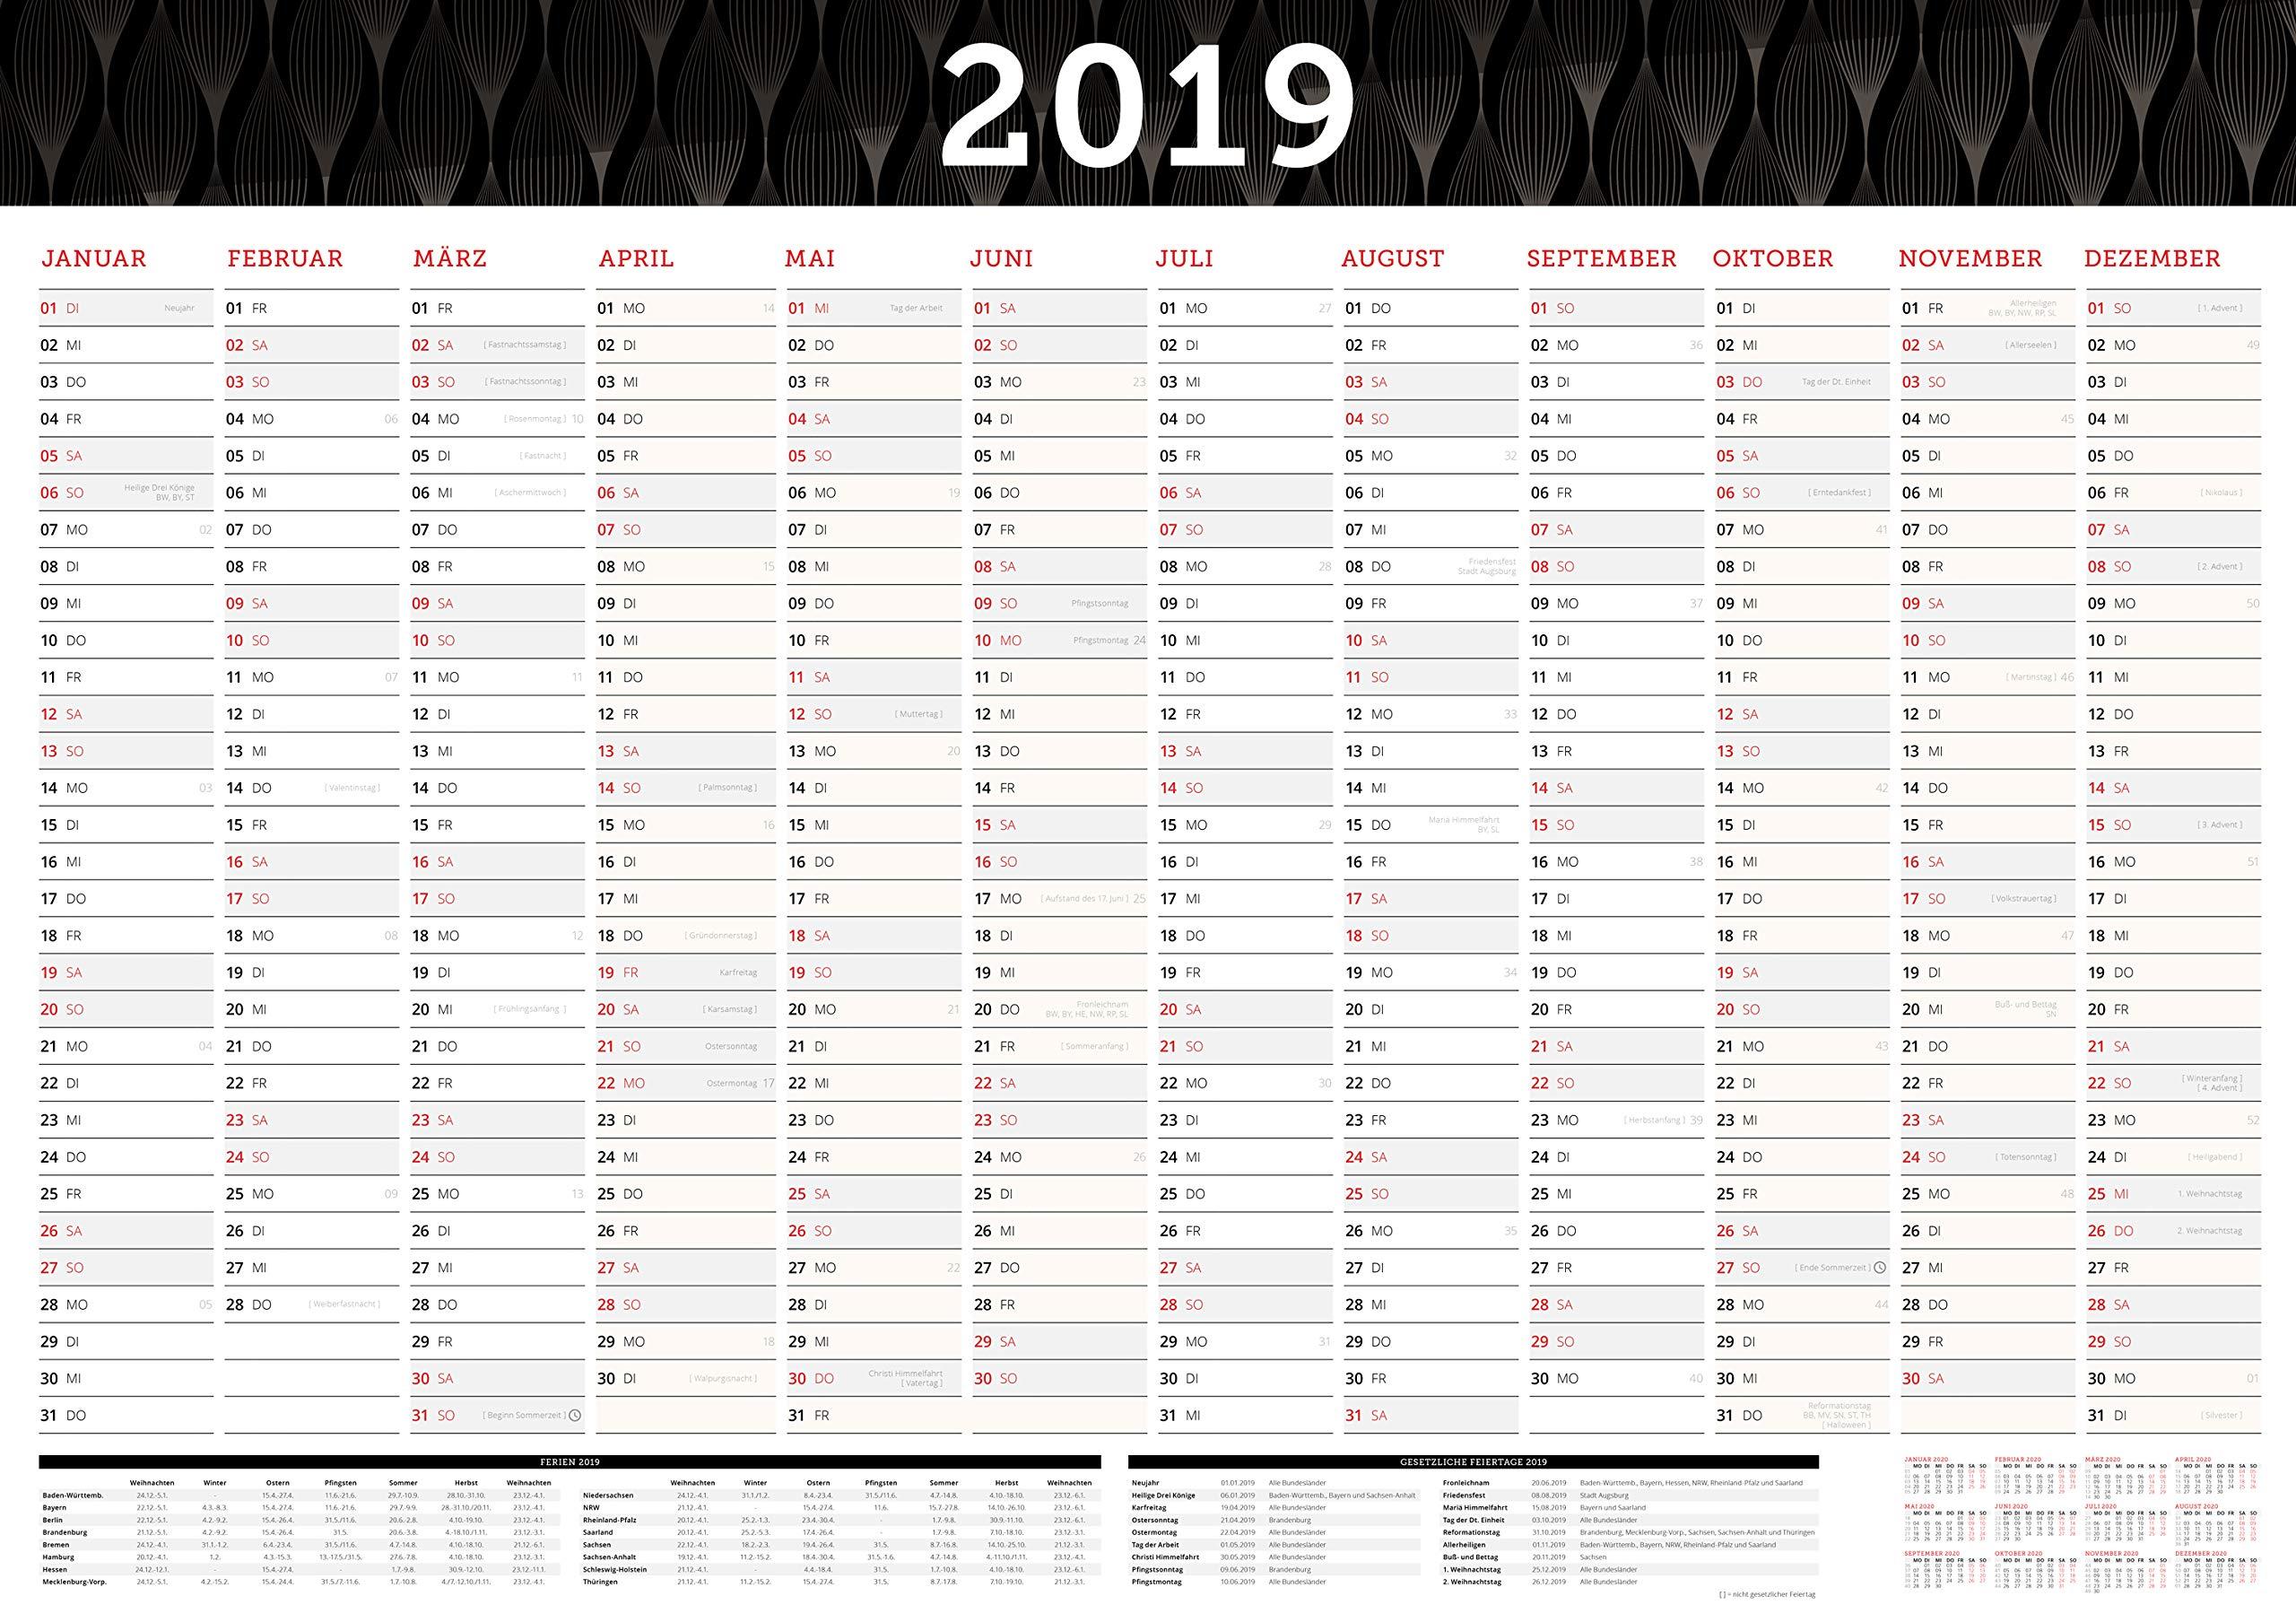 Grosser Wandkalender 2019 In Din A1 84 X 59 4 Cm Gefalzt Furs Buro